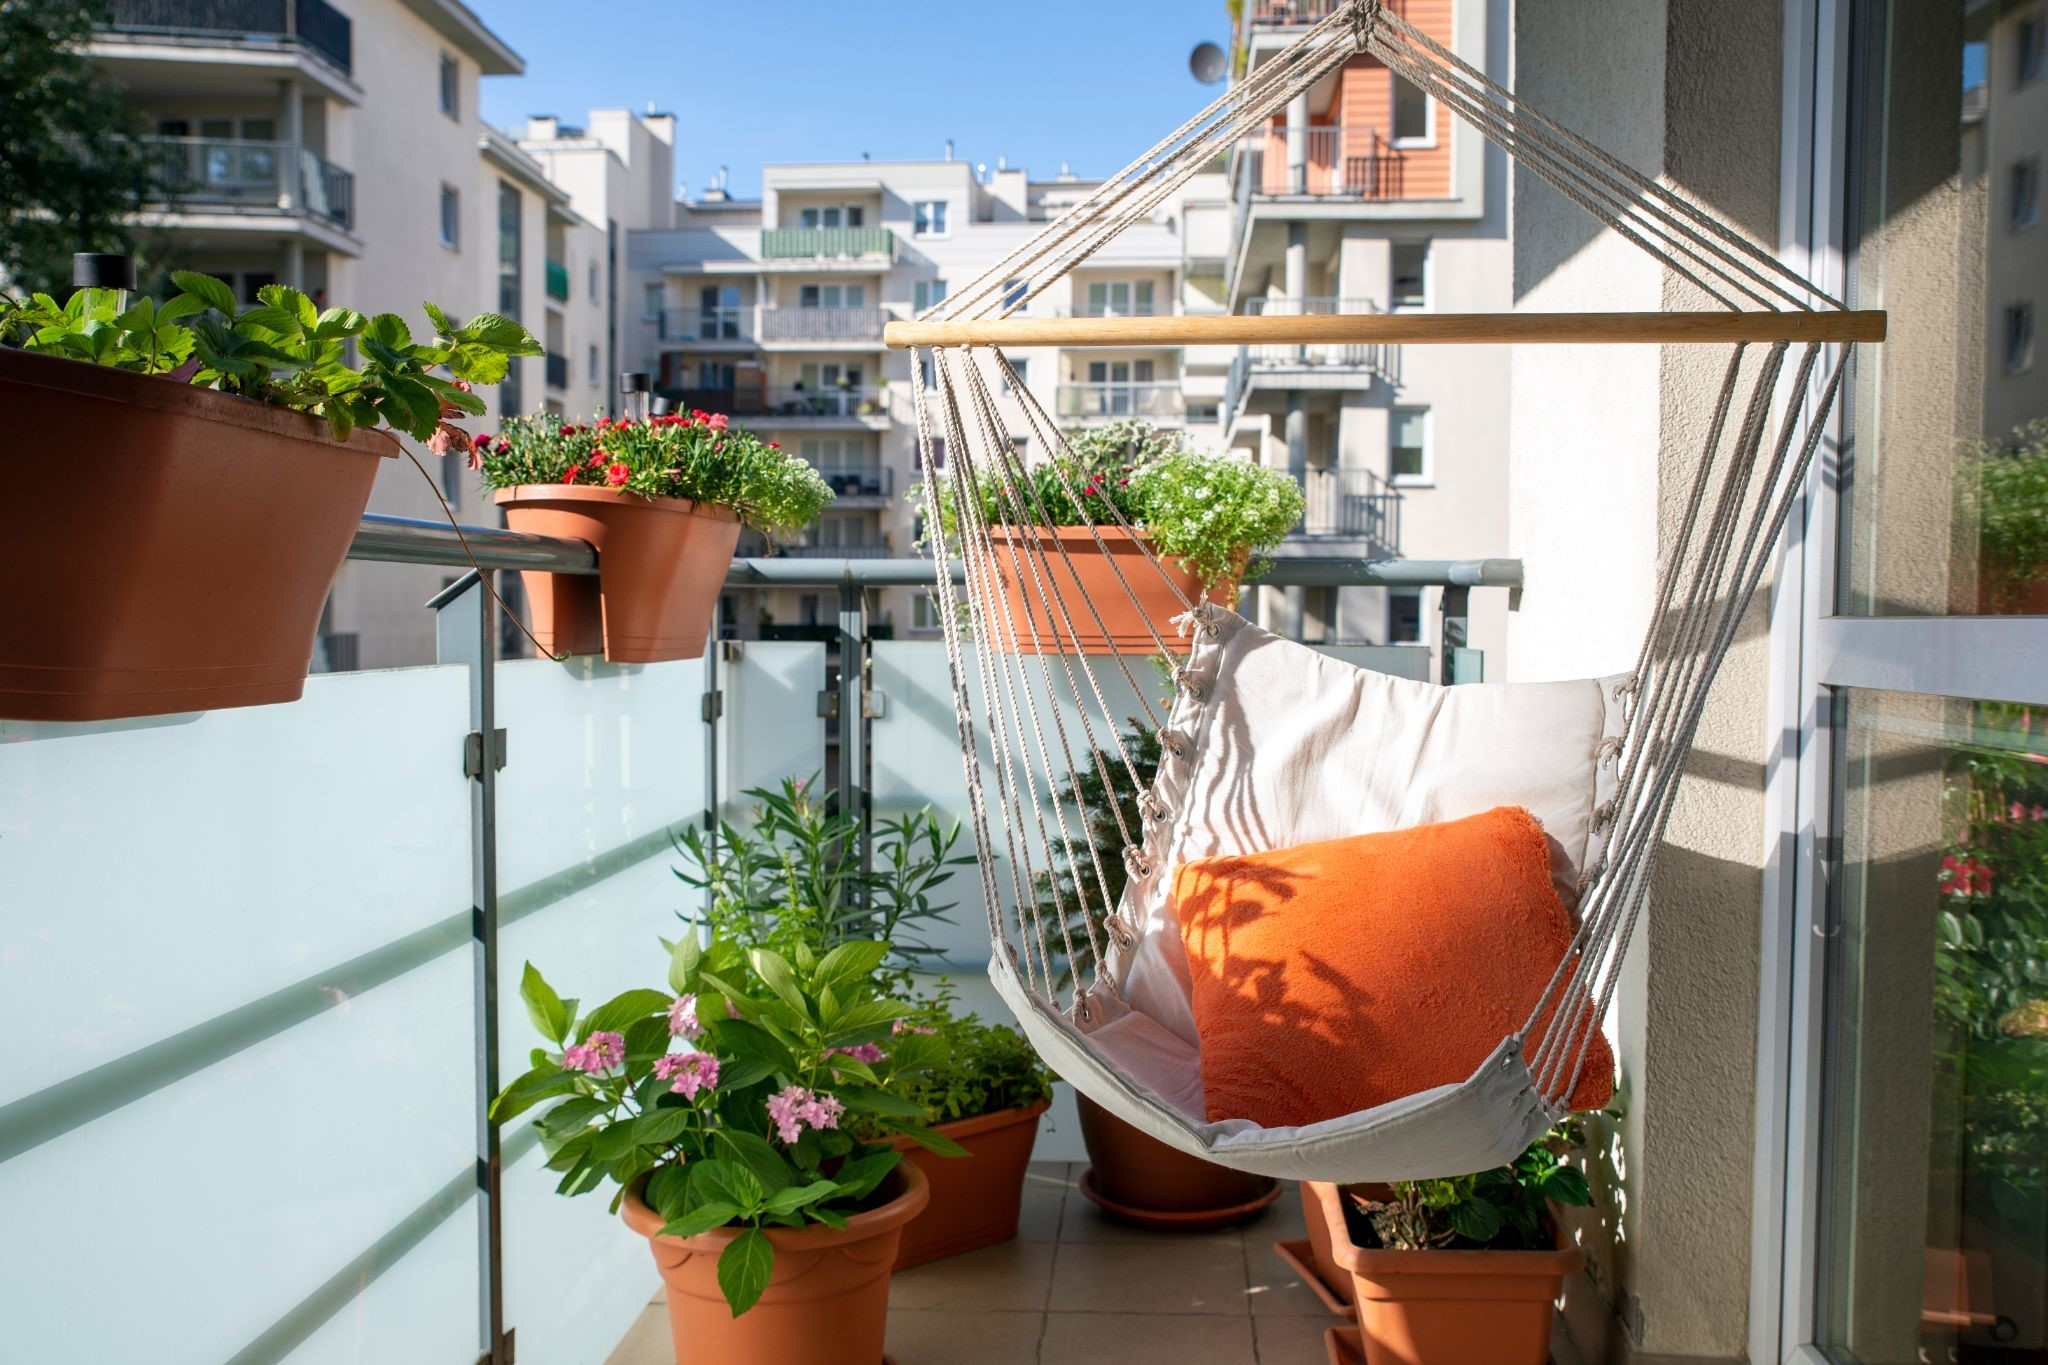 Mediterranean Style Outdoor Area